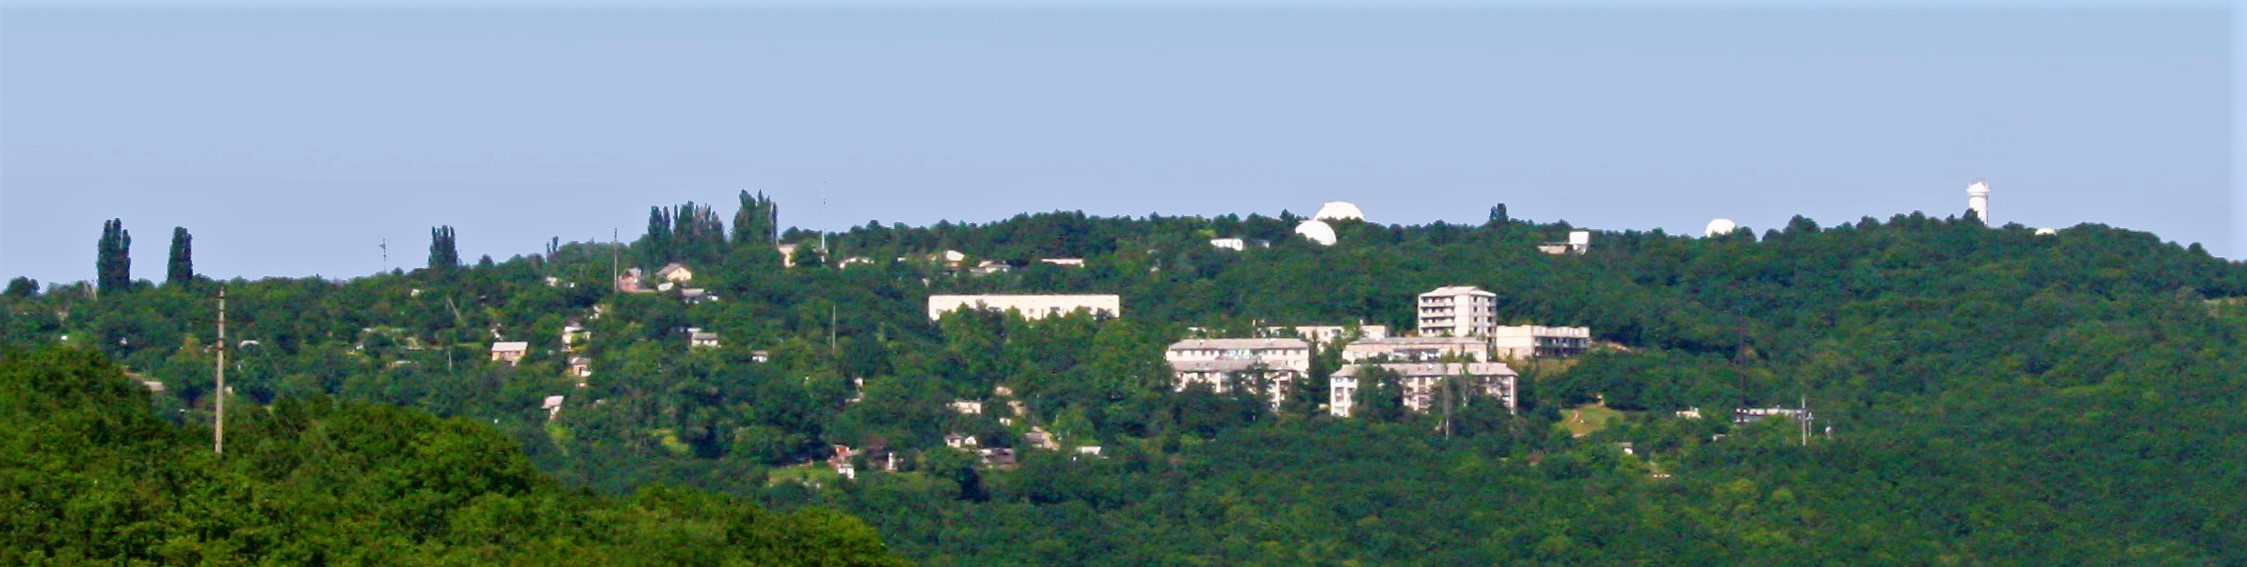 Krim-observatoriet